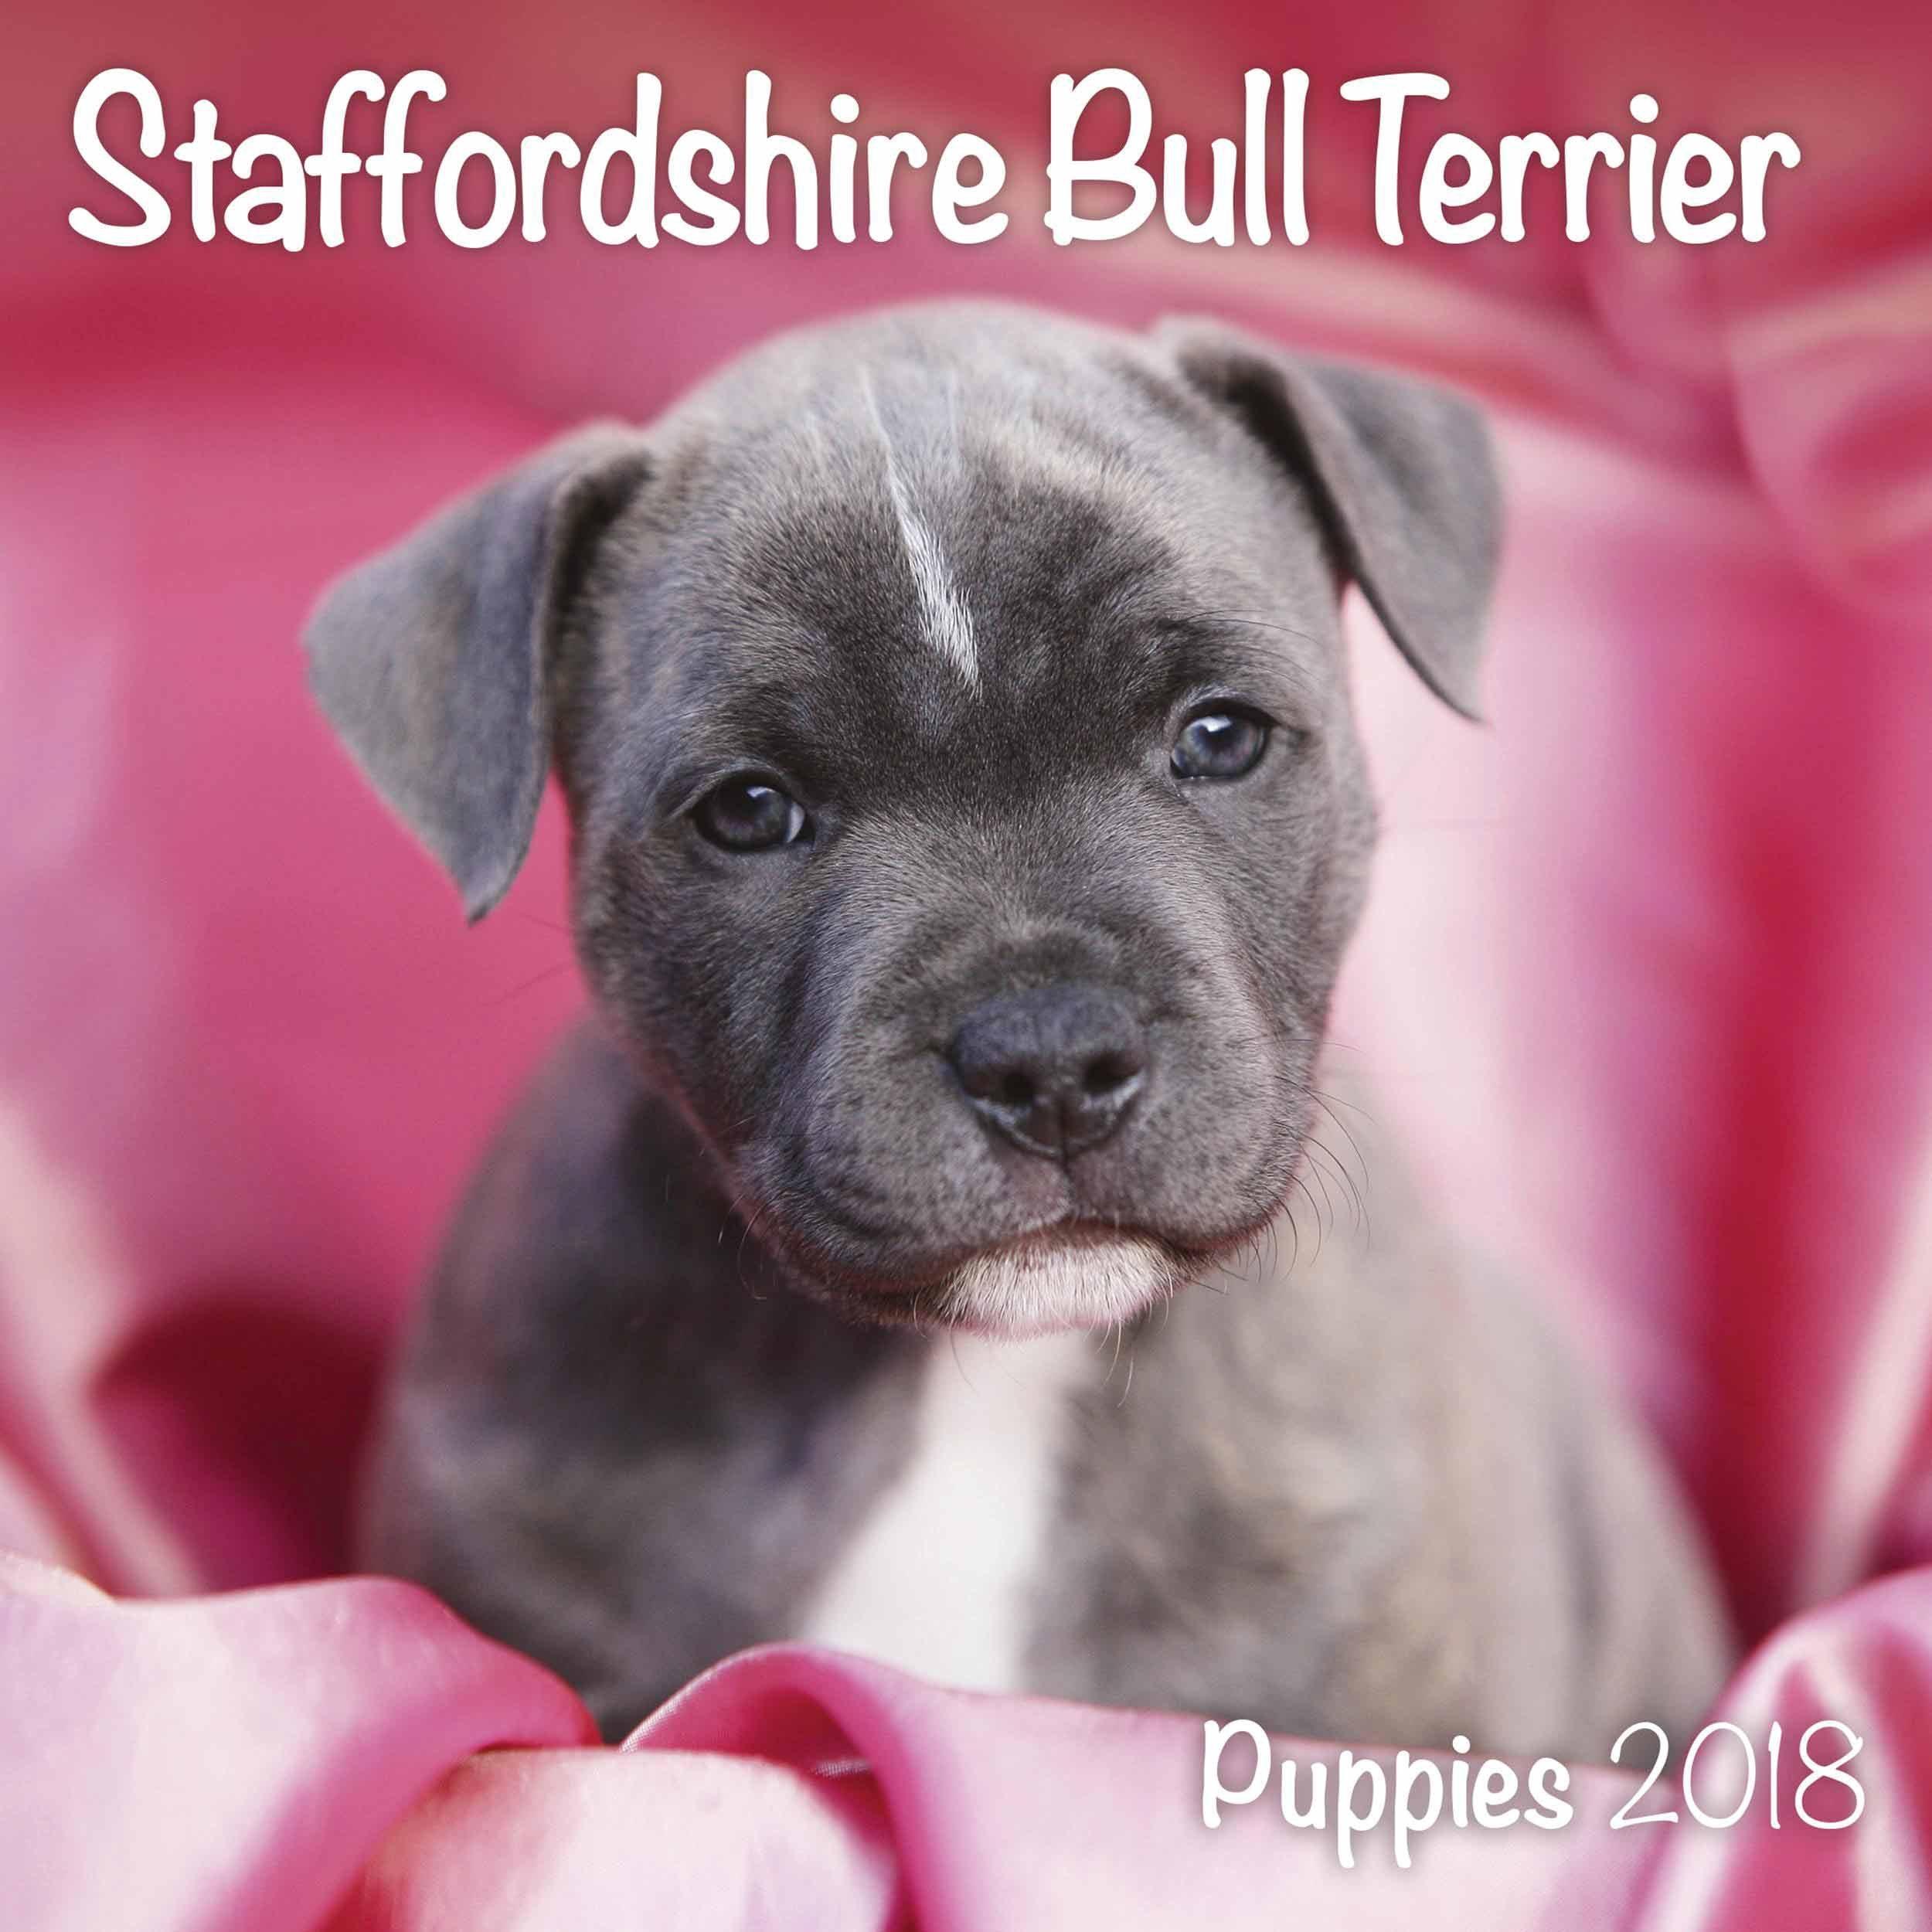 Staffordshire Bull Terrier Puppies M: 9781785802607: Amazon.com: Books